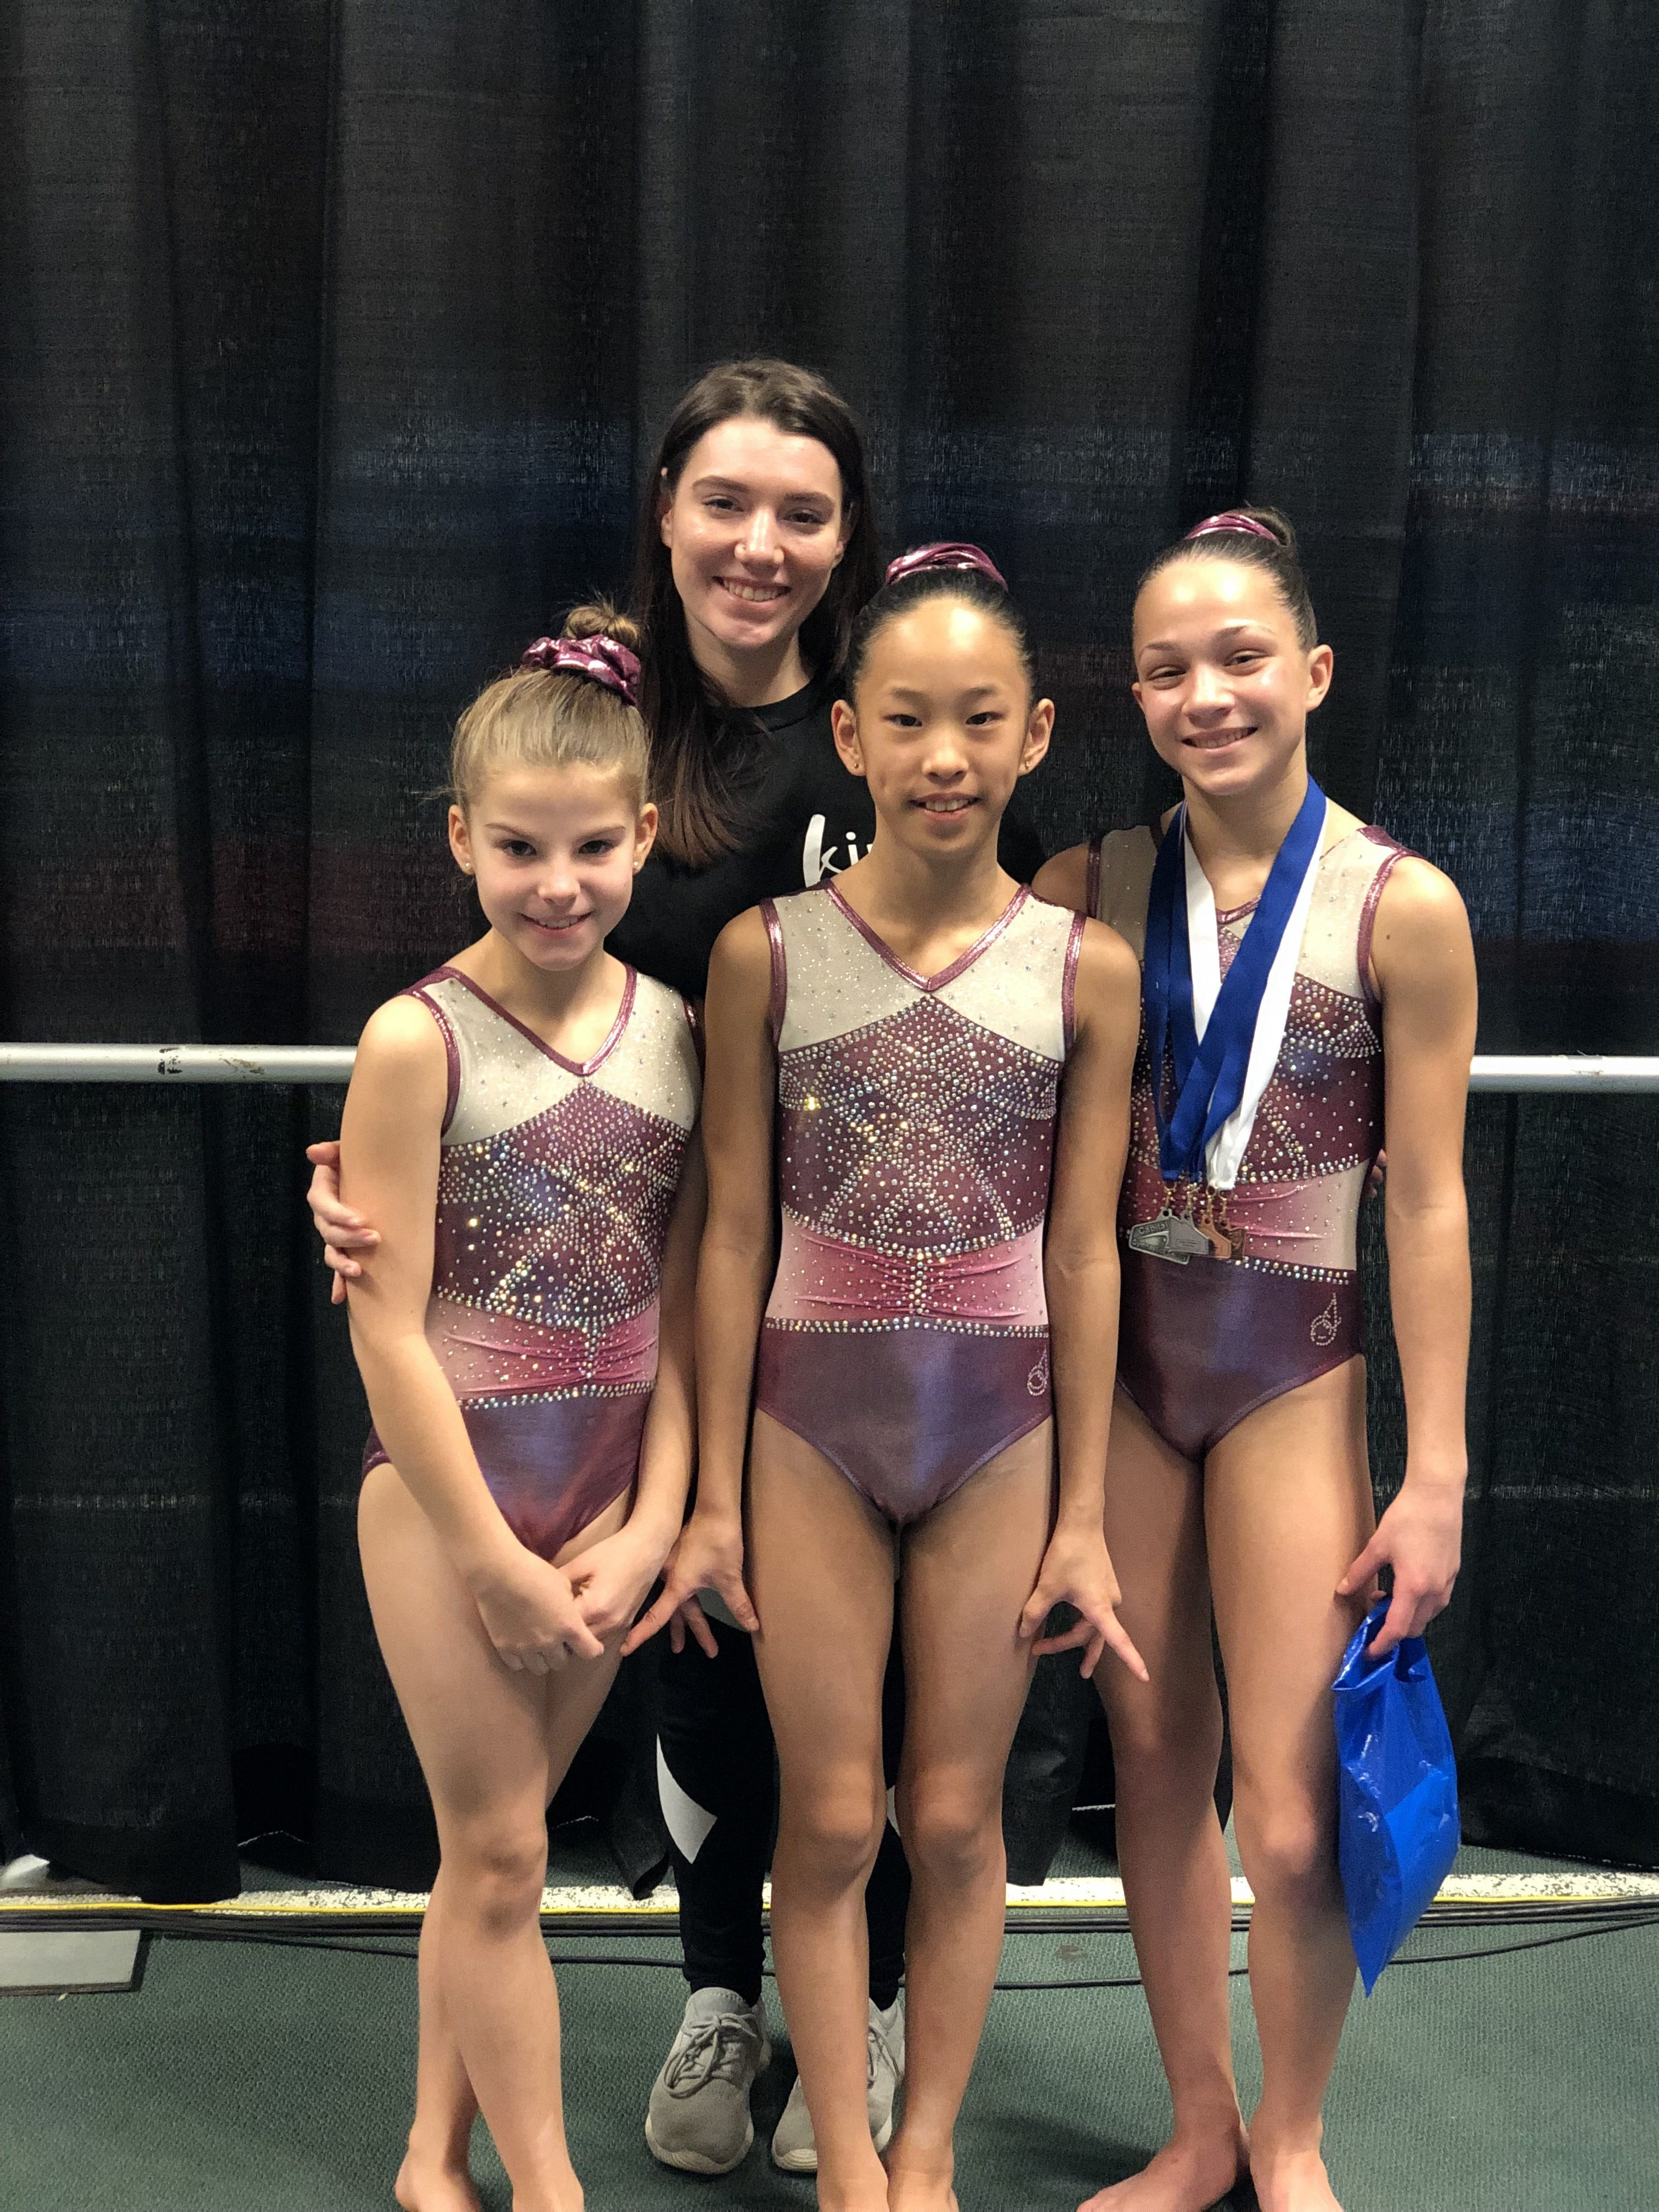 KIN - Calgary Gymnastics Club